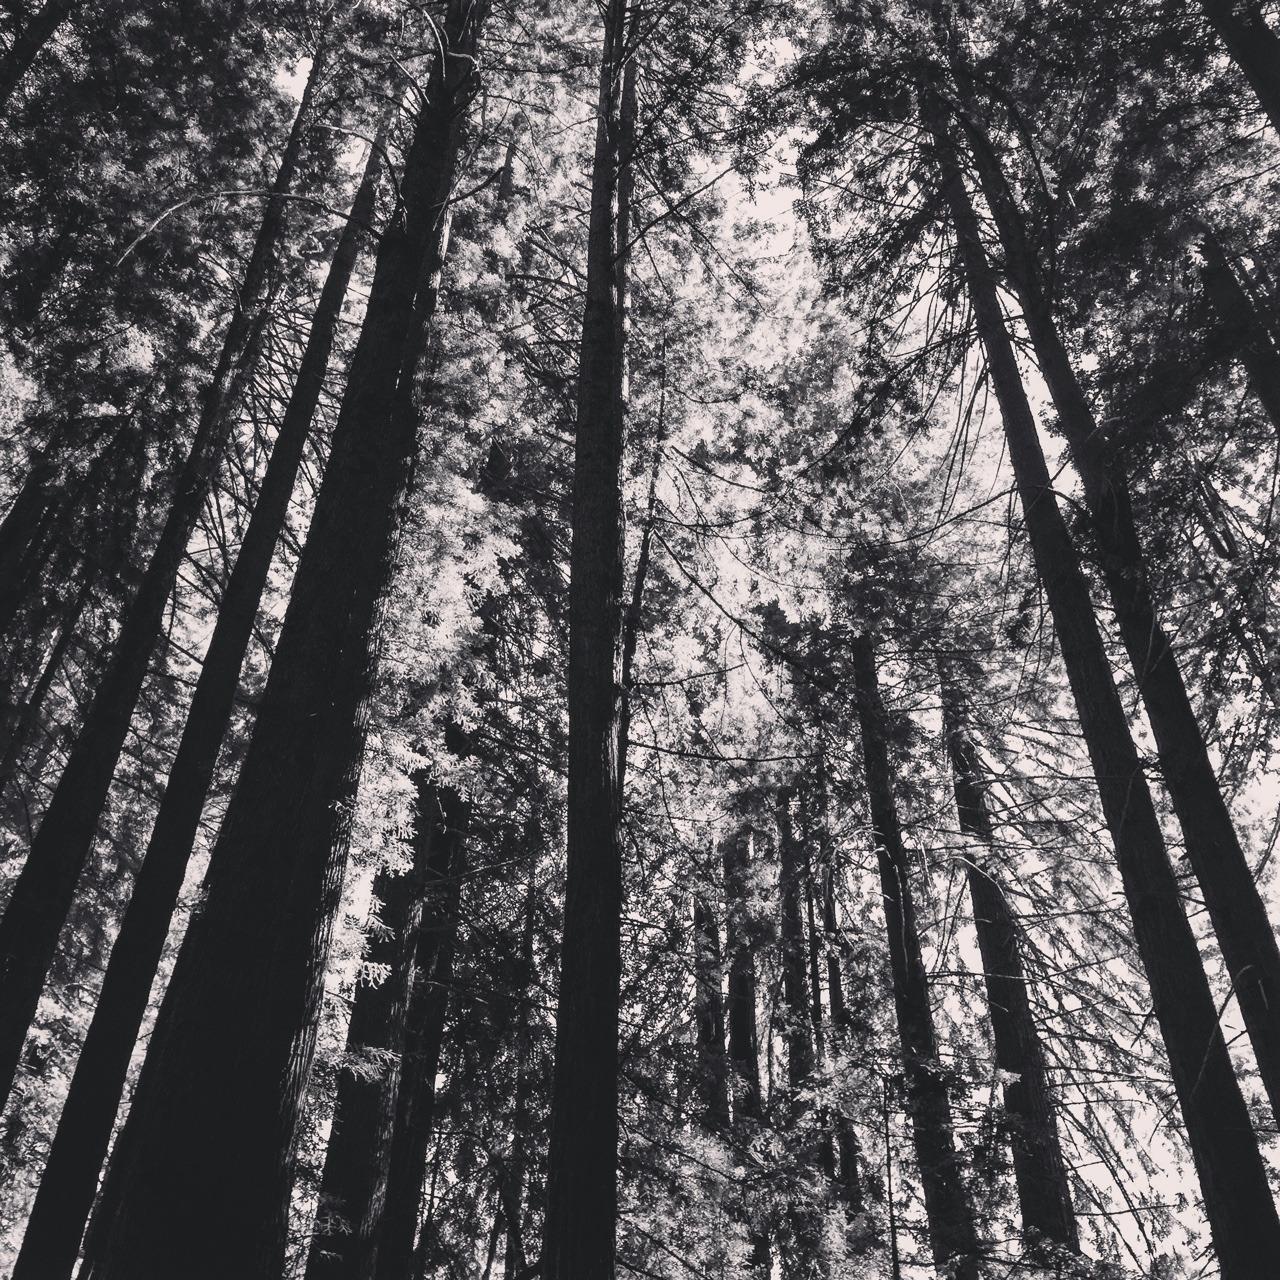 California redwoods.  Mendocino County.  #mendocino #redwoodforest #california